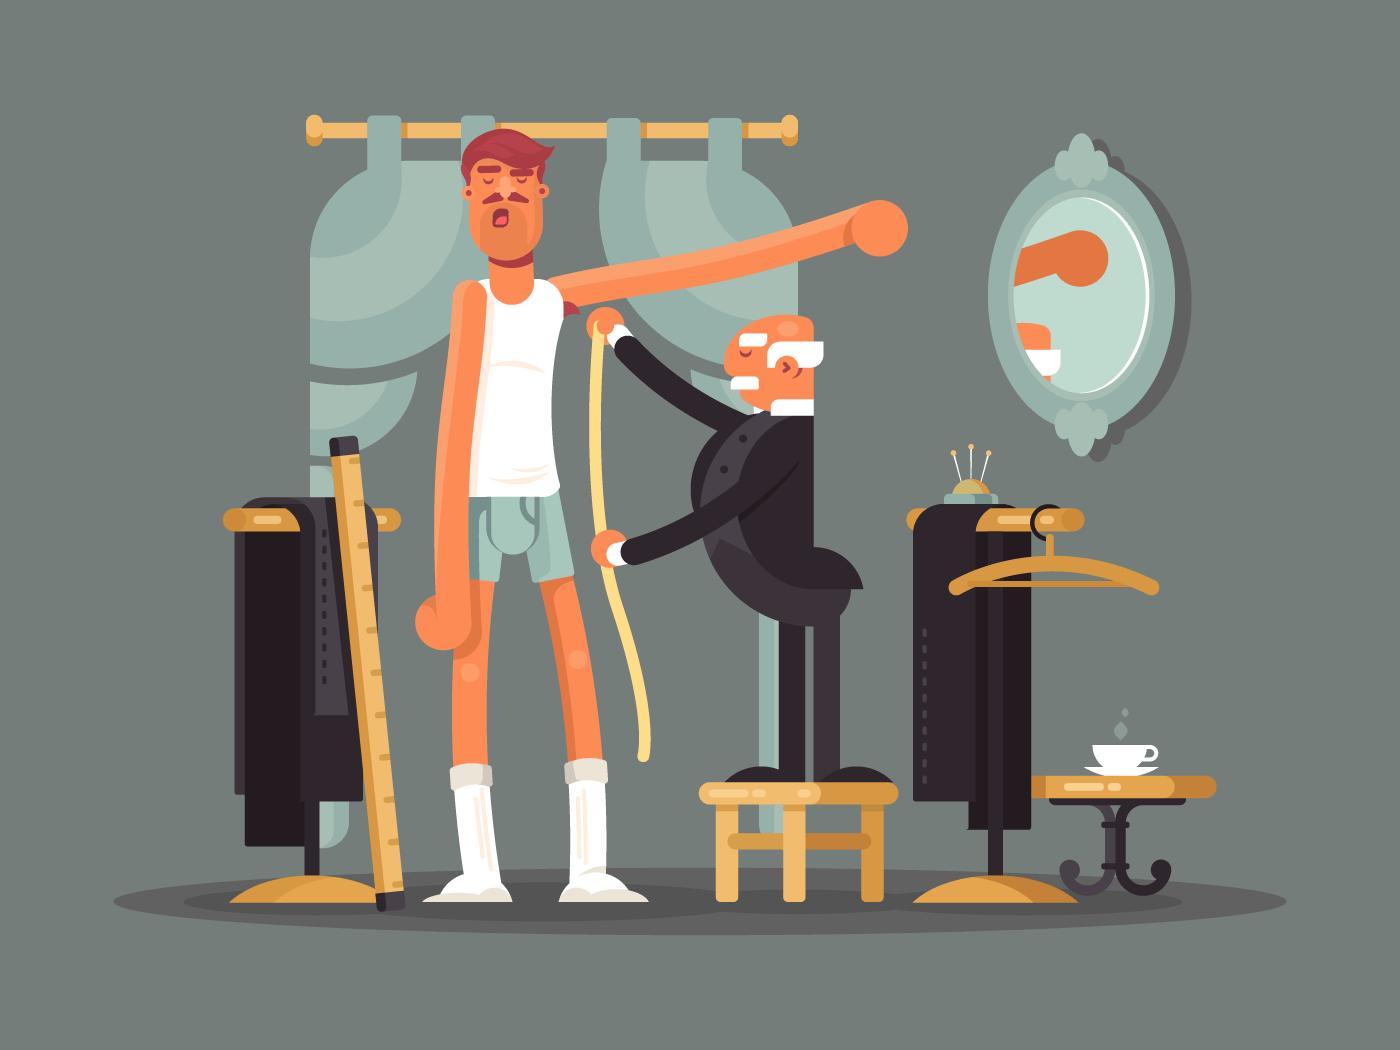 Taking measures at tailor shop flat vector illustration